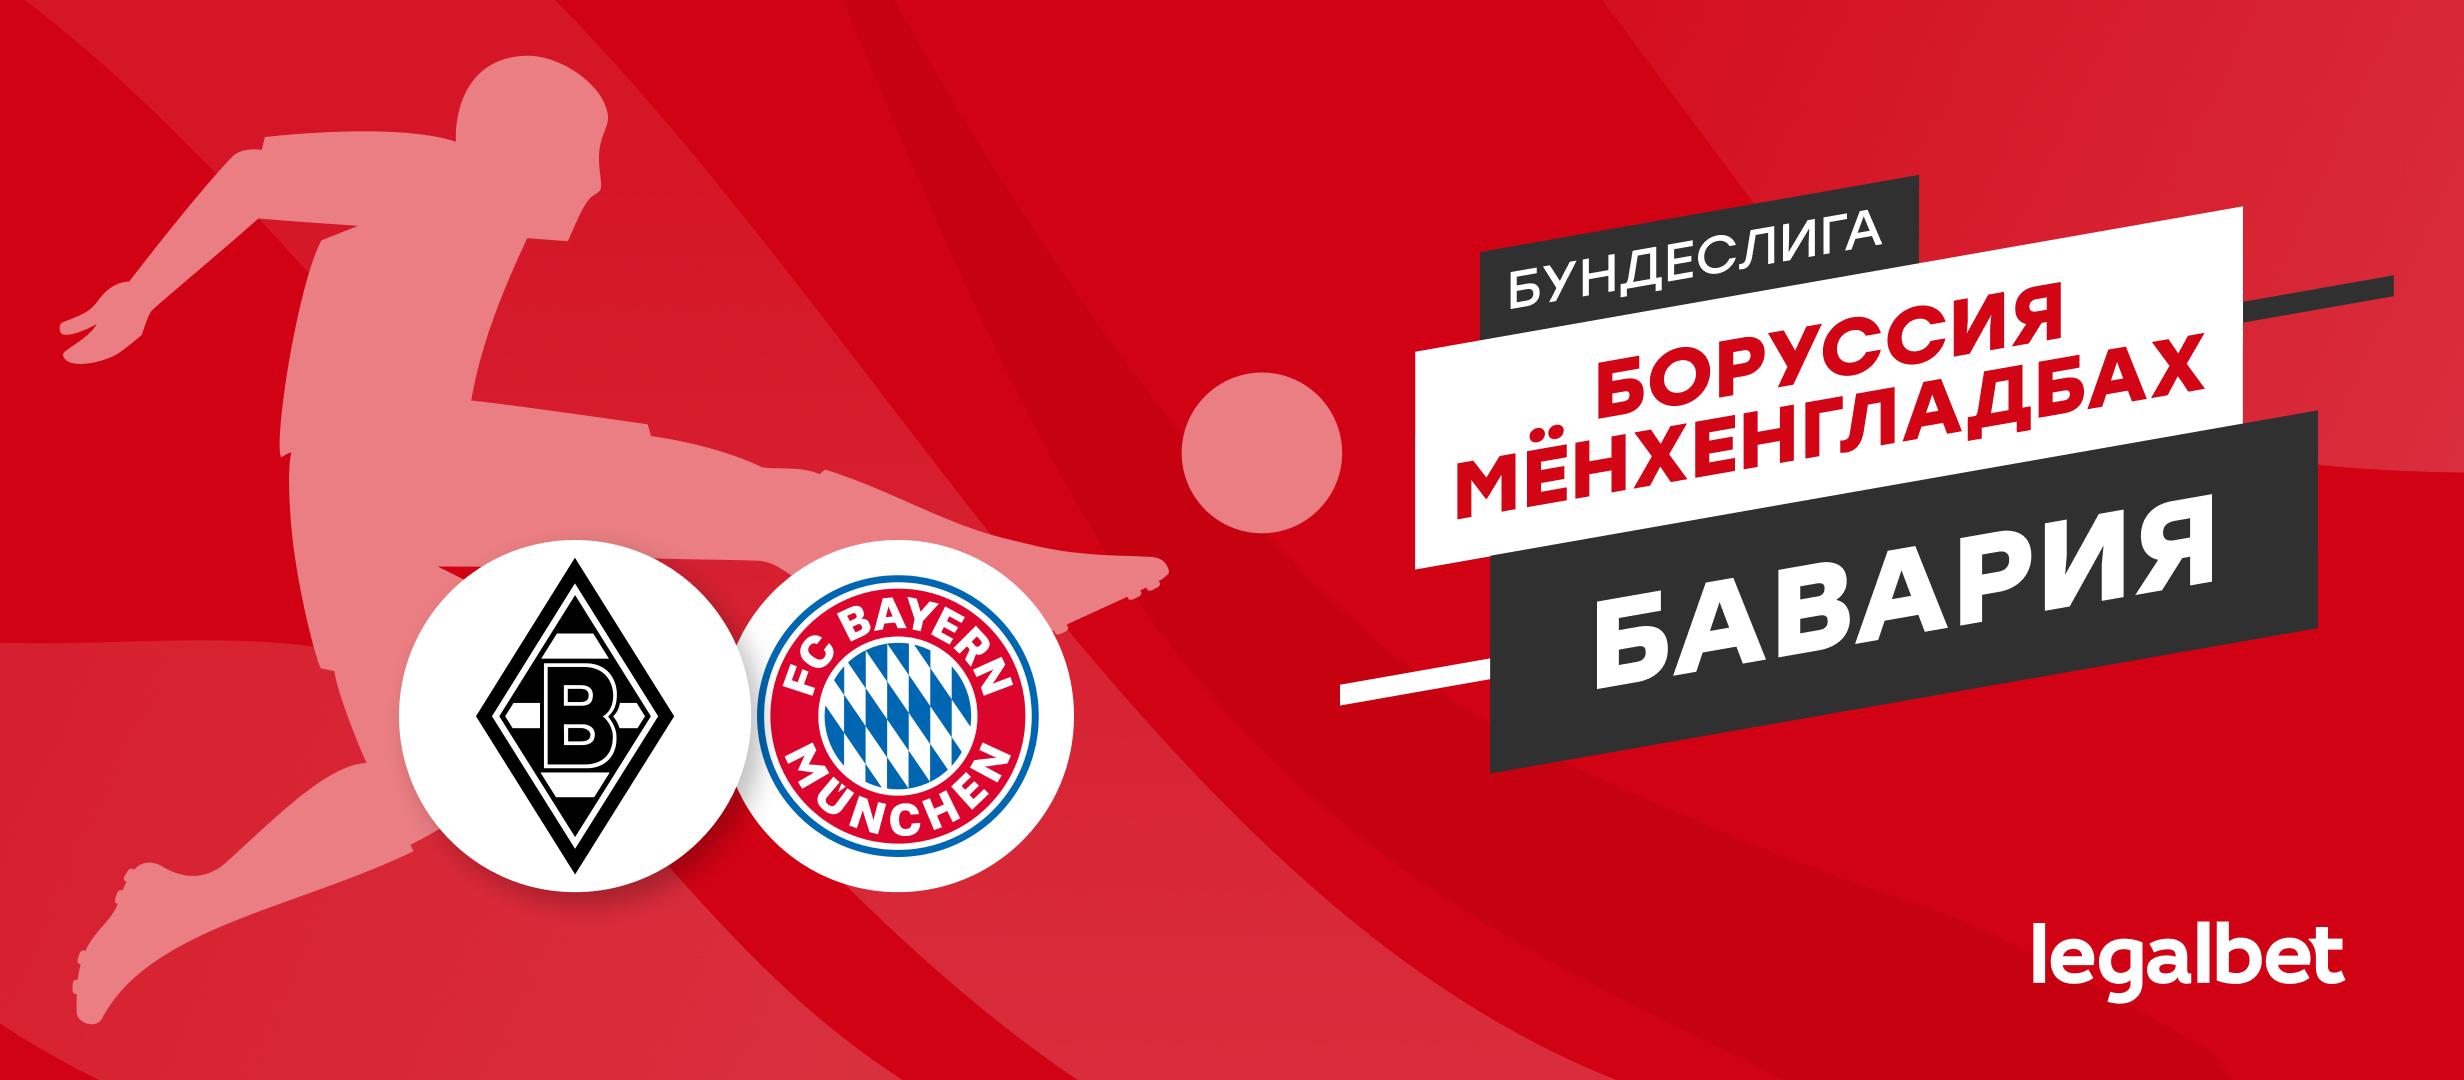 «Боруссия» Мёнхенгладбах — «Бавария»: ставки и коэффициенты на матч